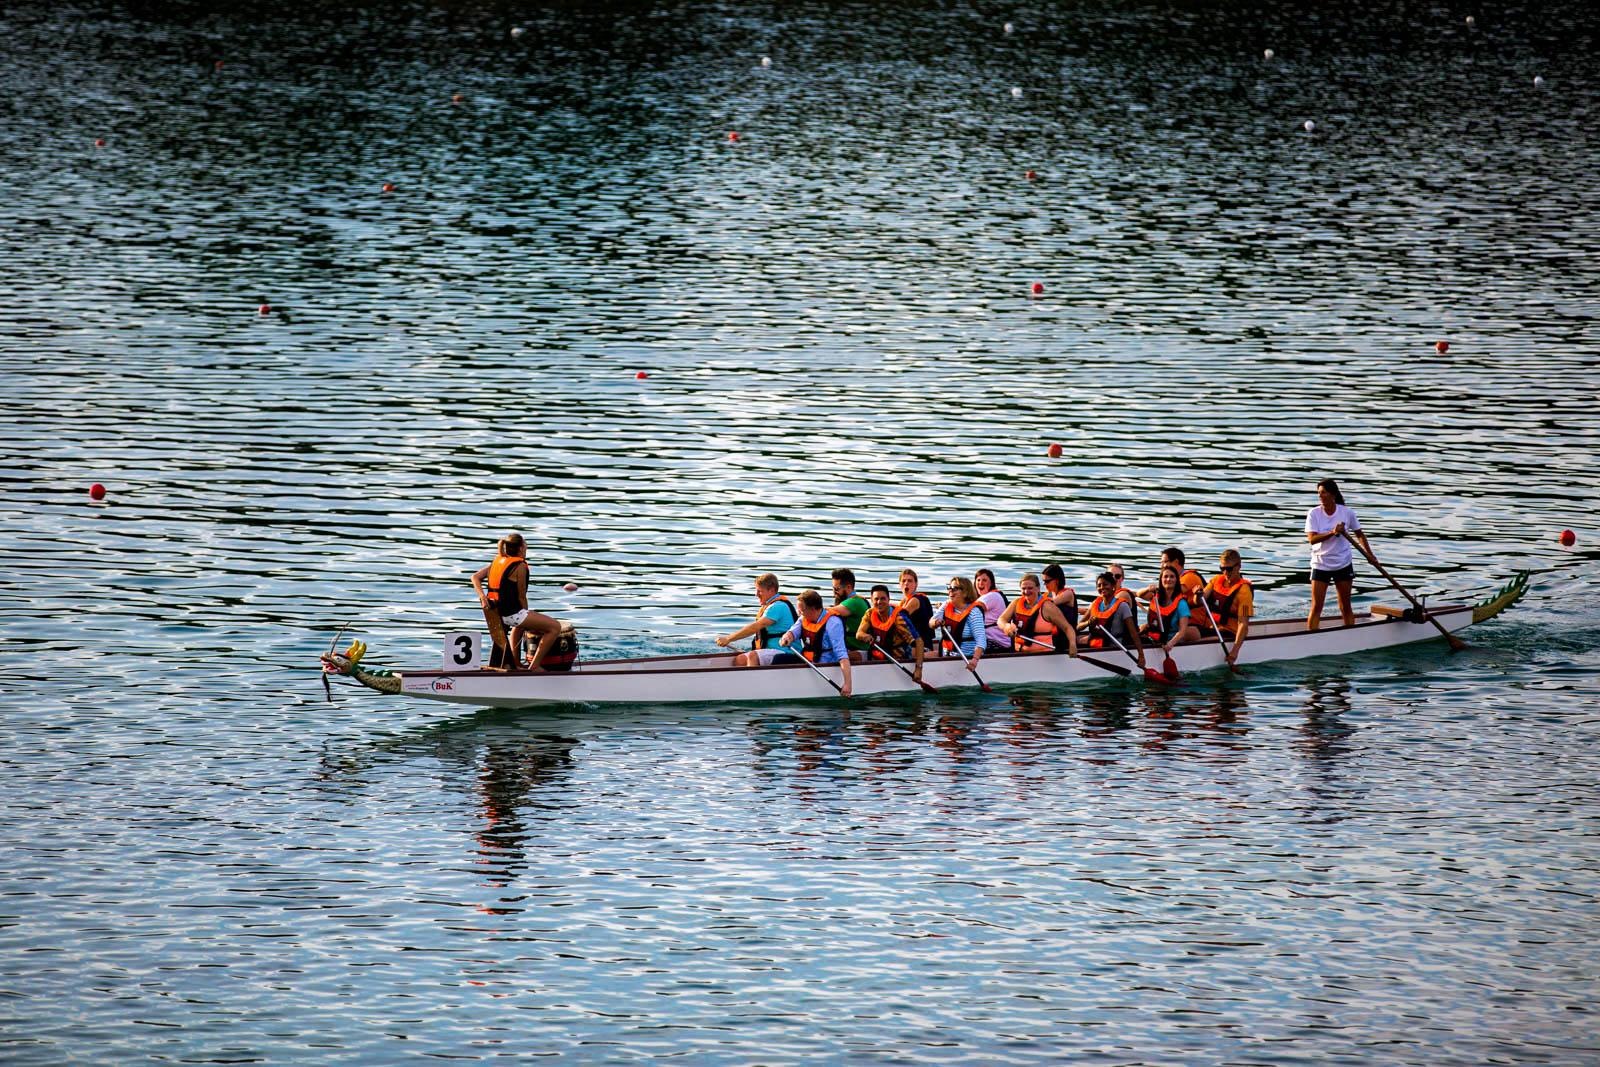 Am Munich Beach das Drachenbootrennen buchen